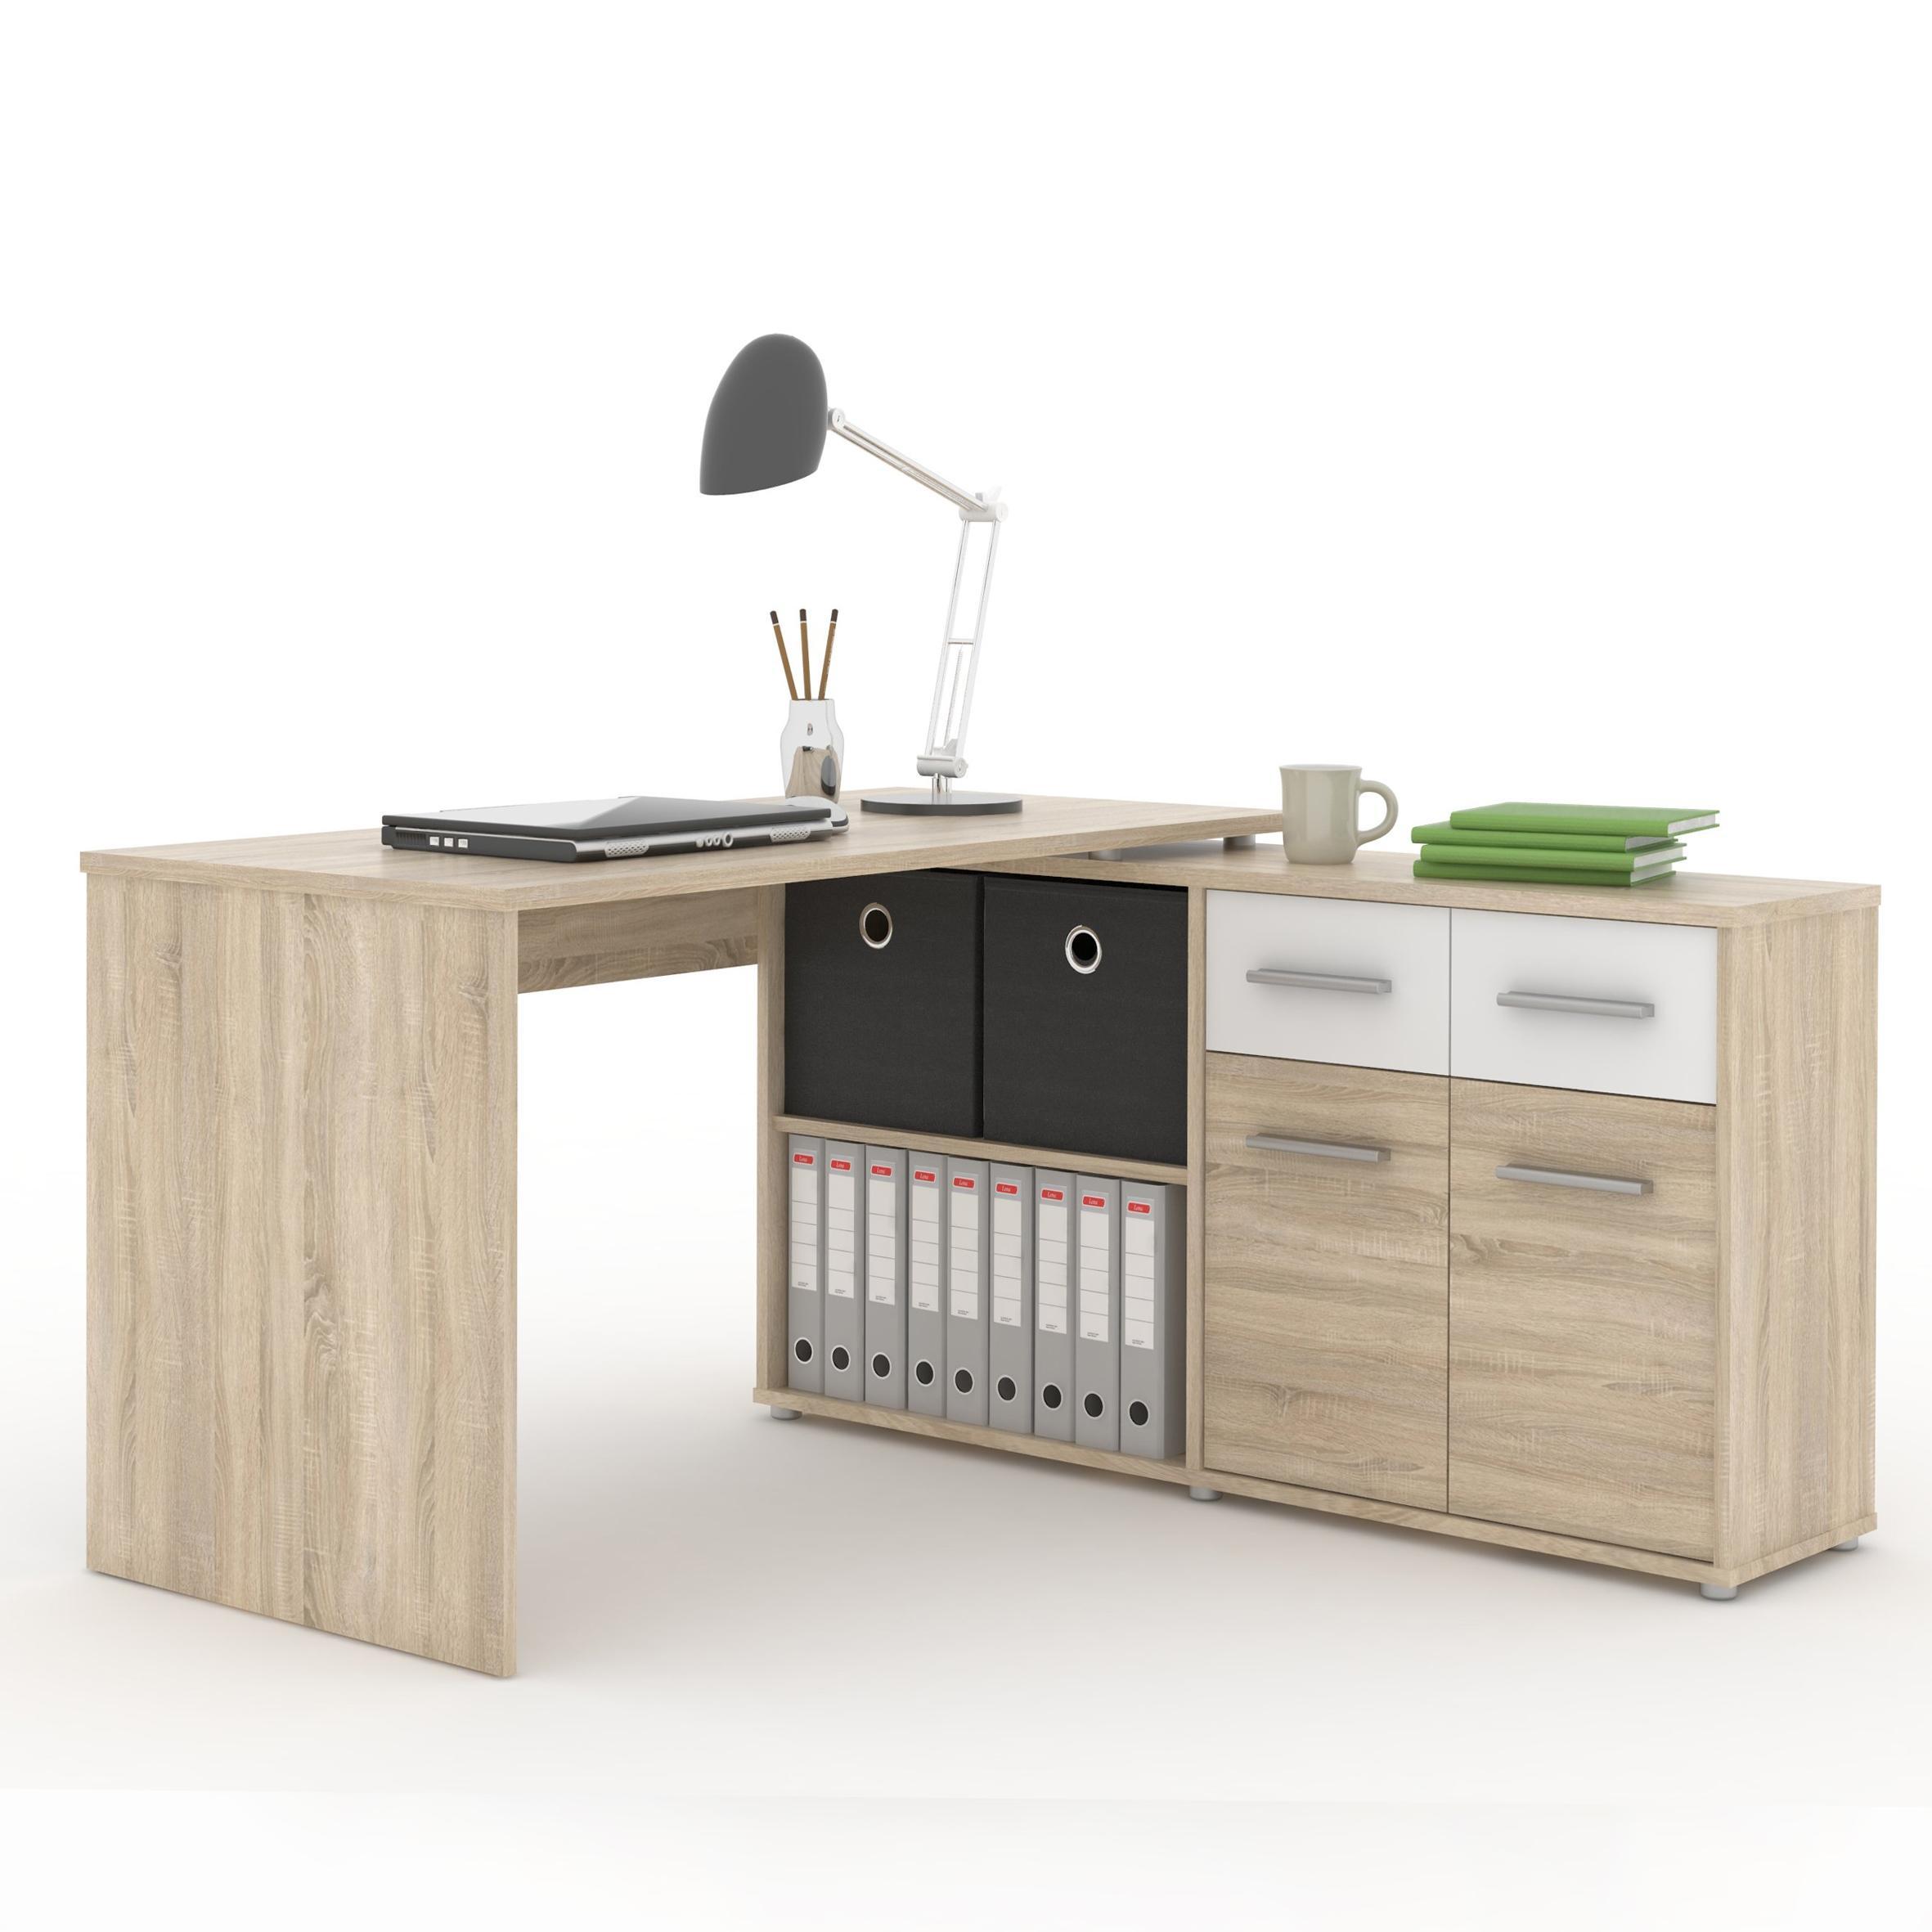 PC stolík, dub sonoma/biela, RAFAEL